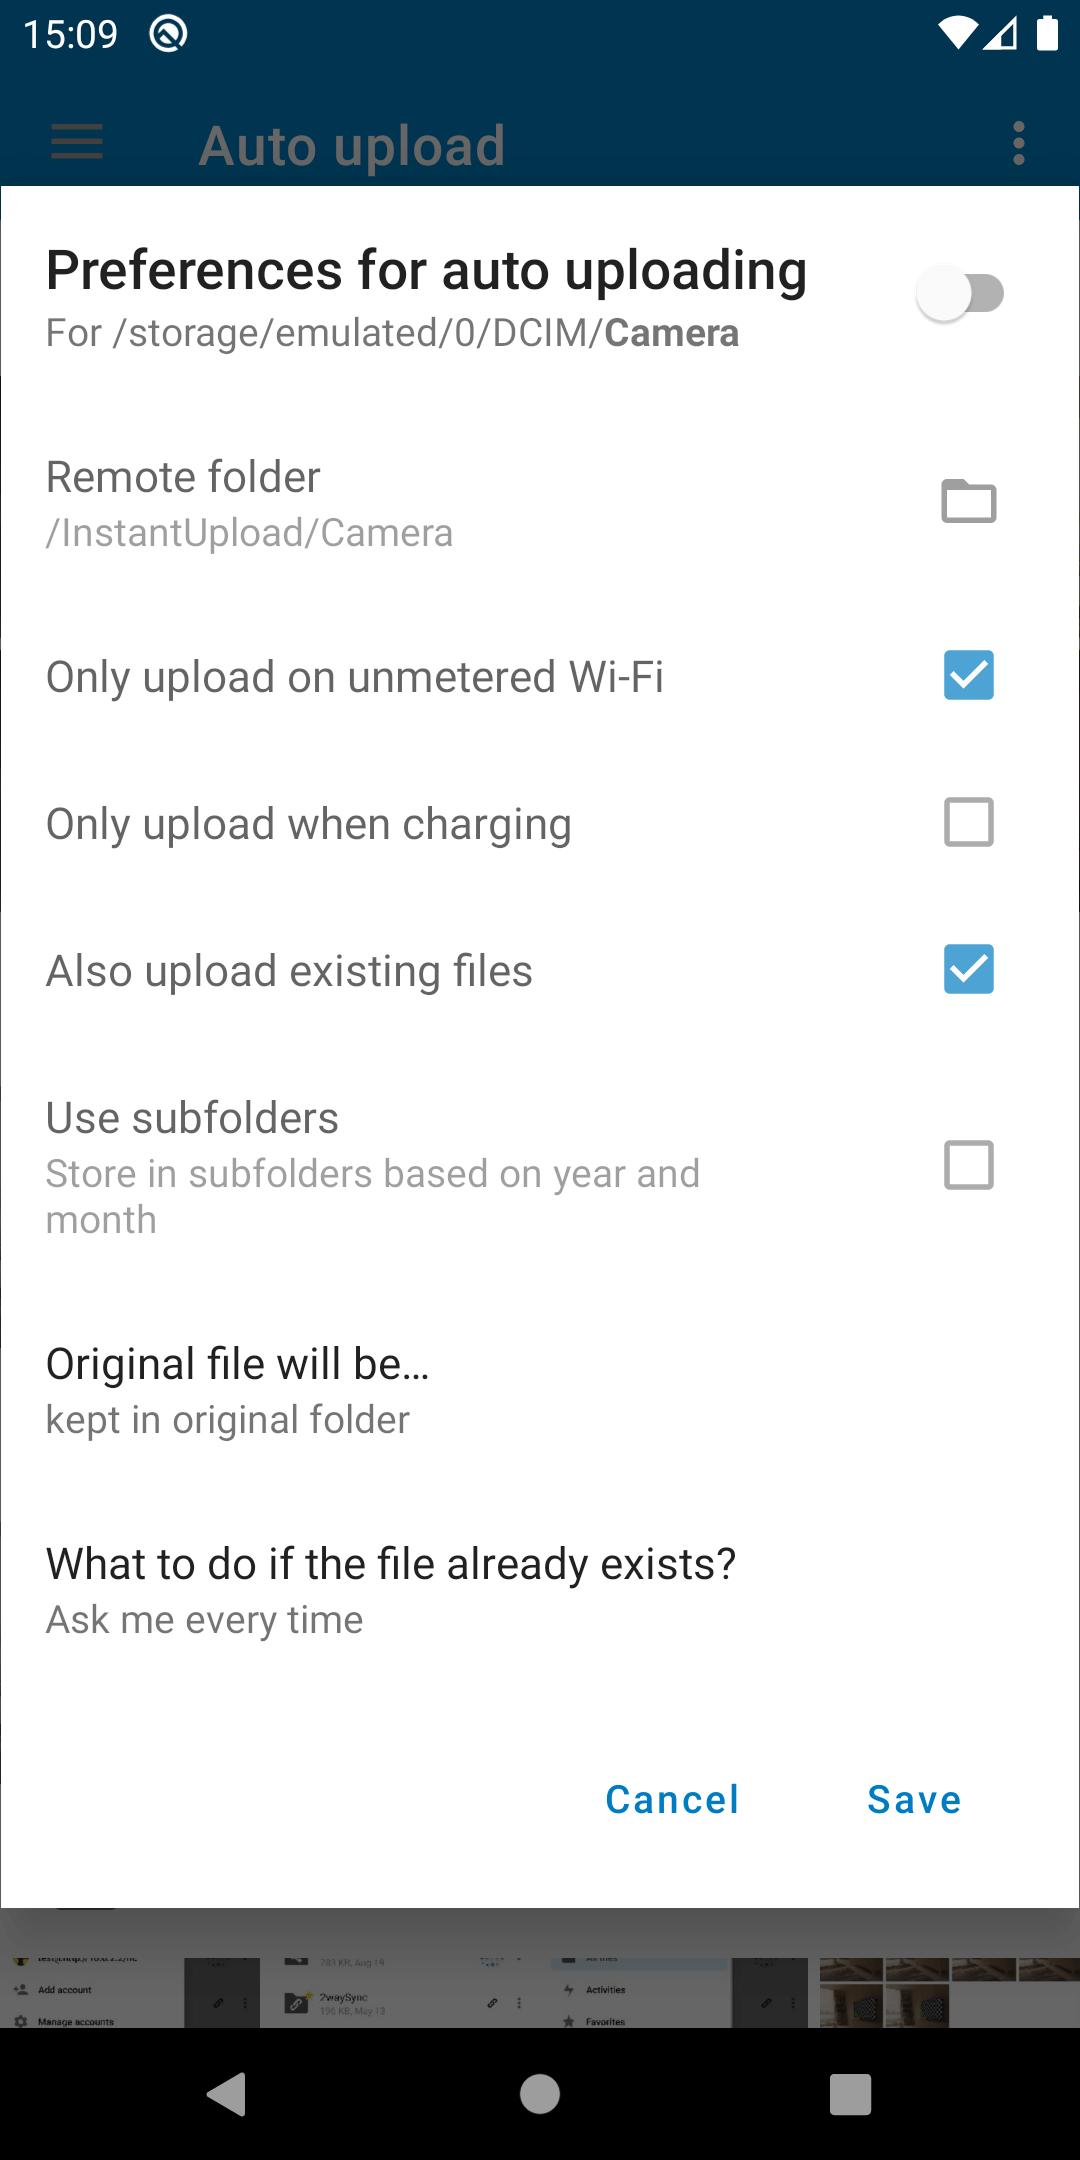 auto upload preferences